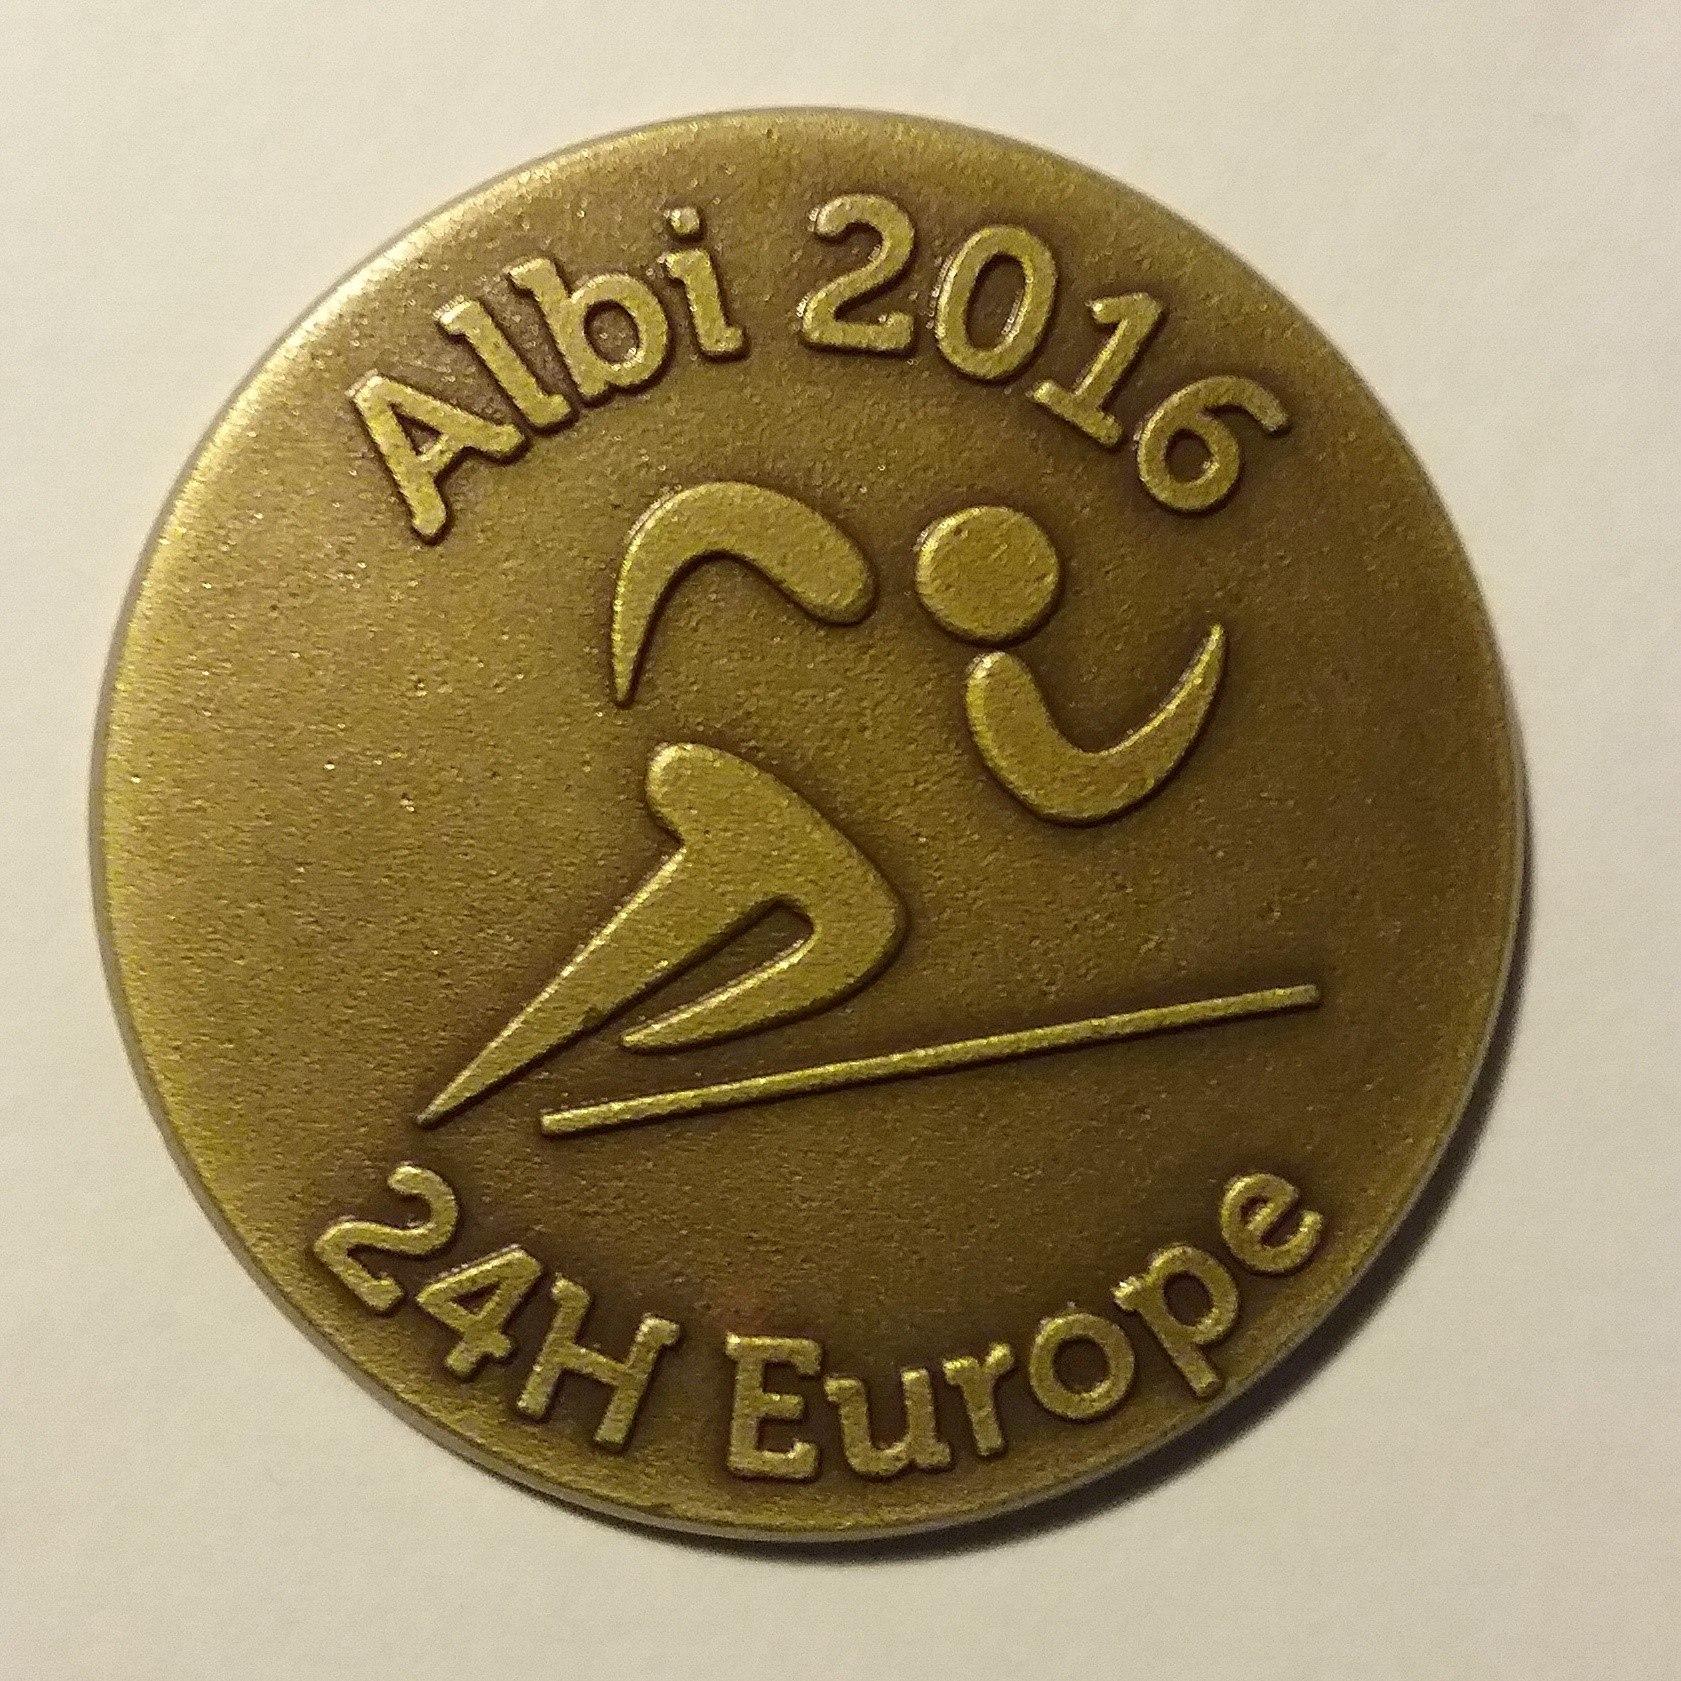 Účastnická medaile ze závodu. (zdroj Facebook)